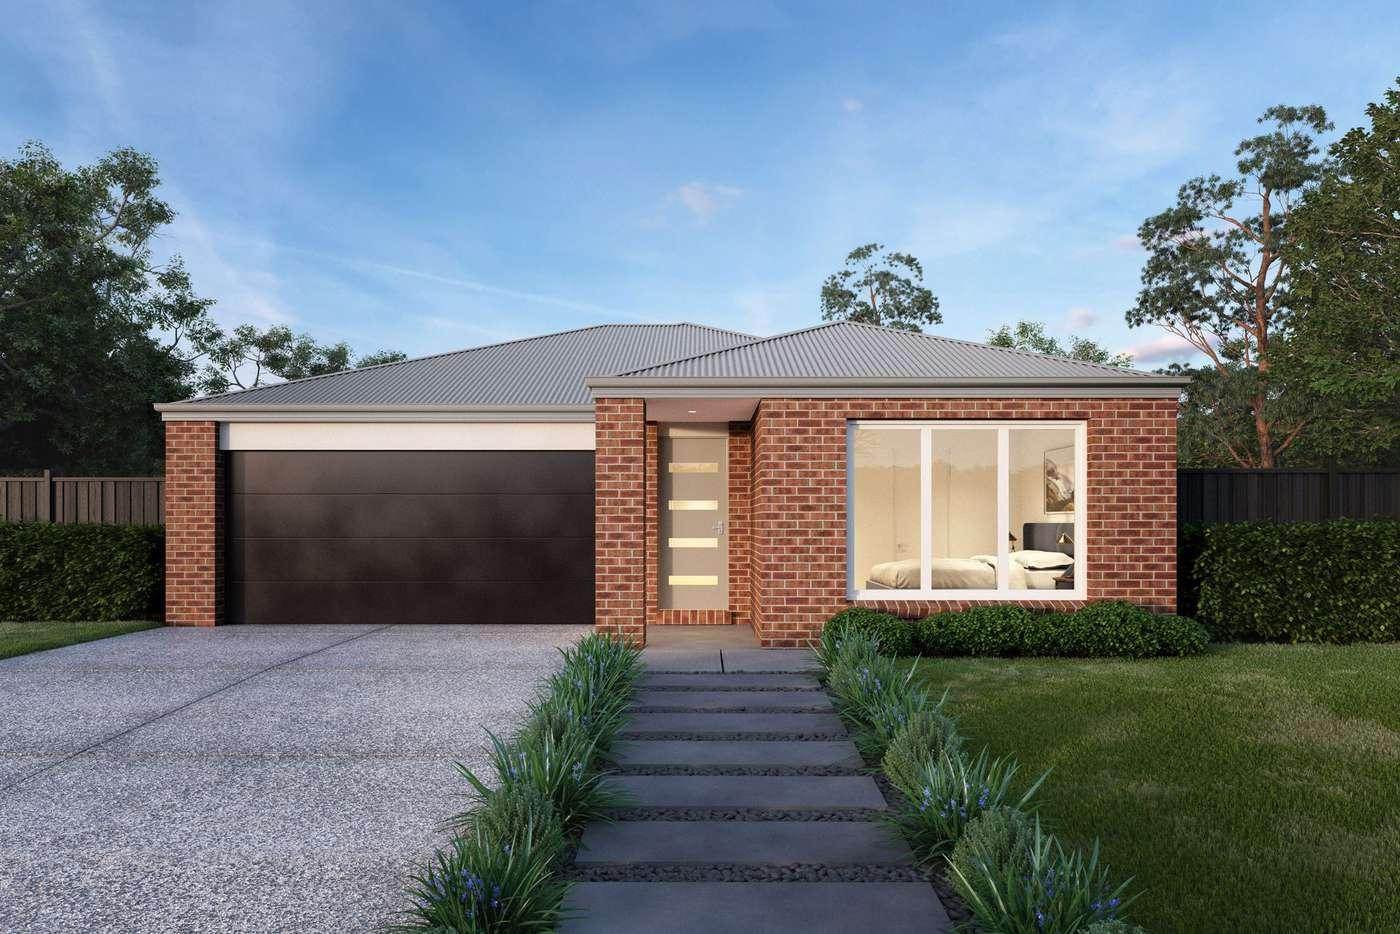 Main view of Homely house listing, 2/421 Walnut Avenue, Mildura VIC 3500